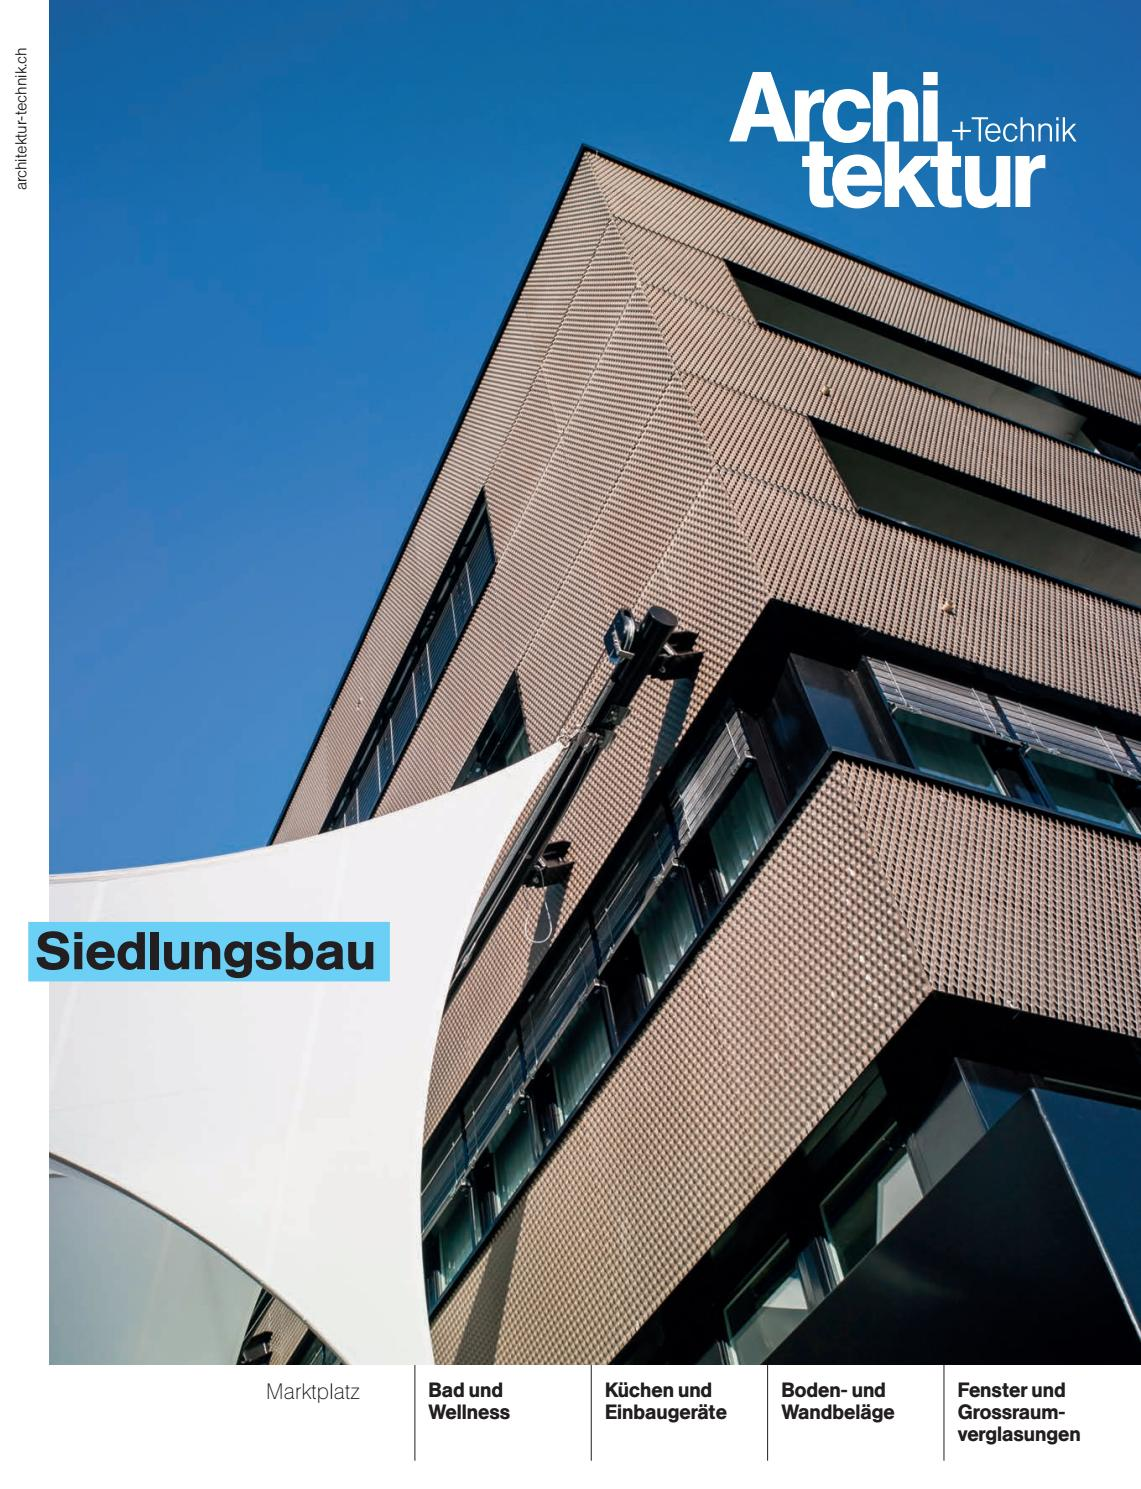 Architektur+Technik 12 2015 by BL Verlag AG - issuu